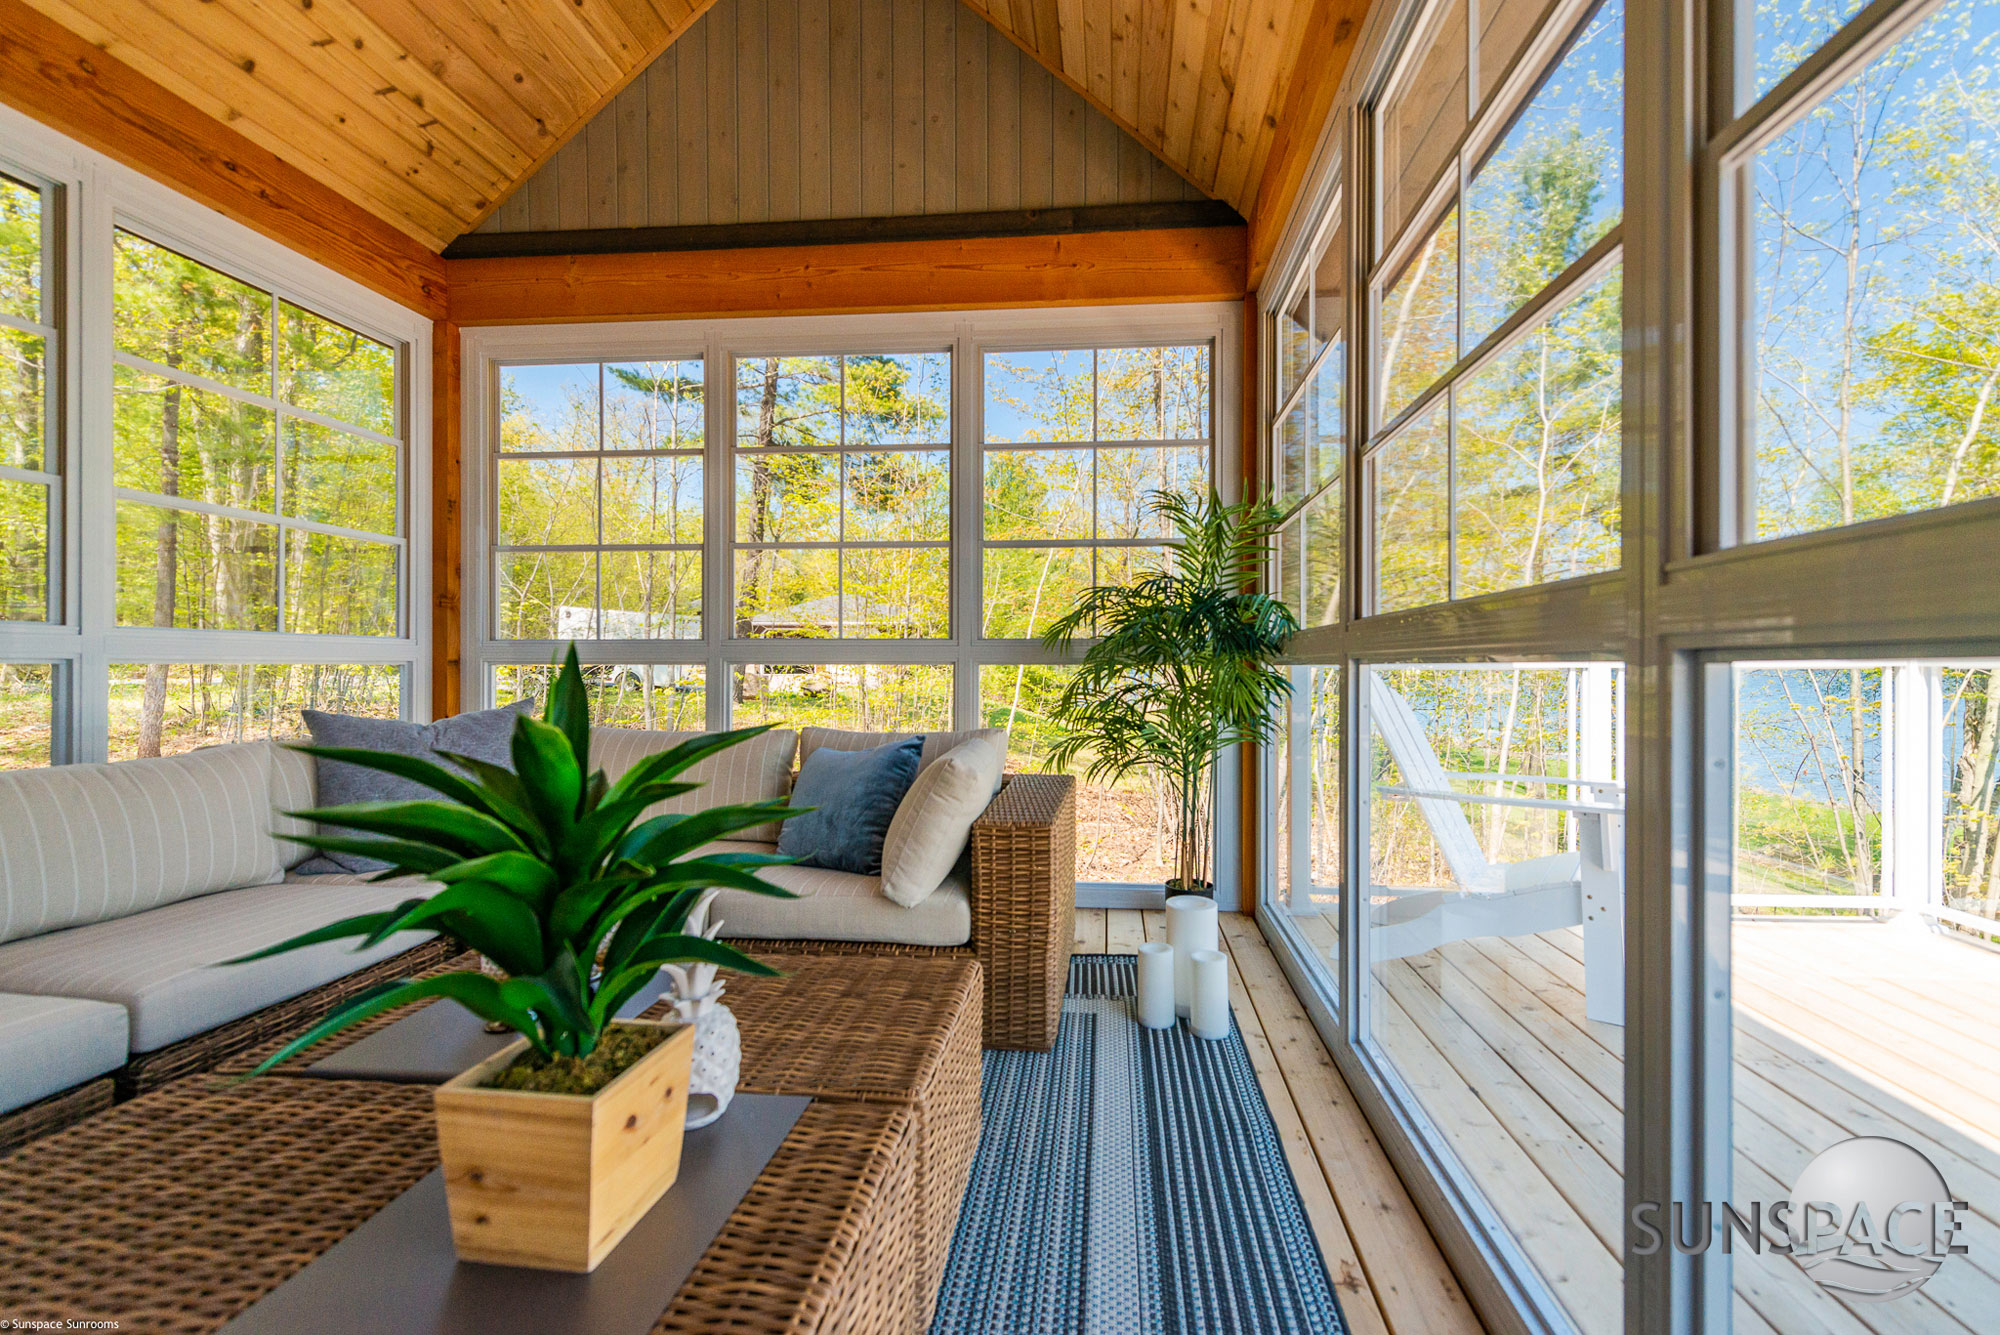 sunspace sunrooms kentucky porch